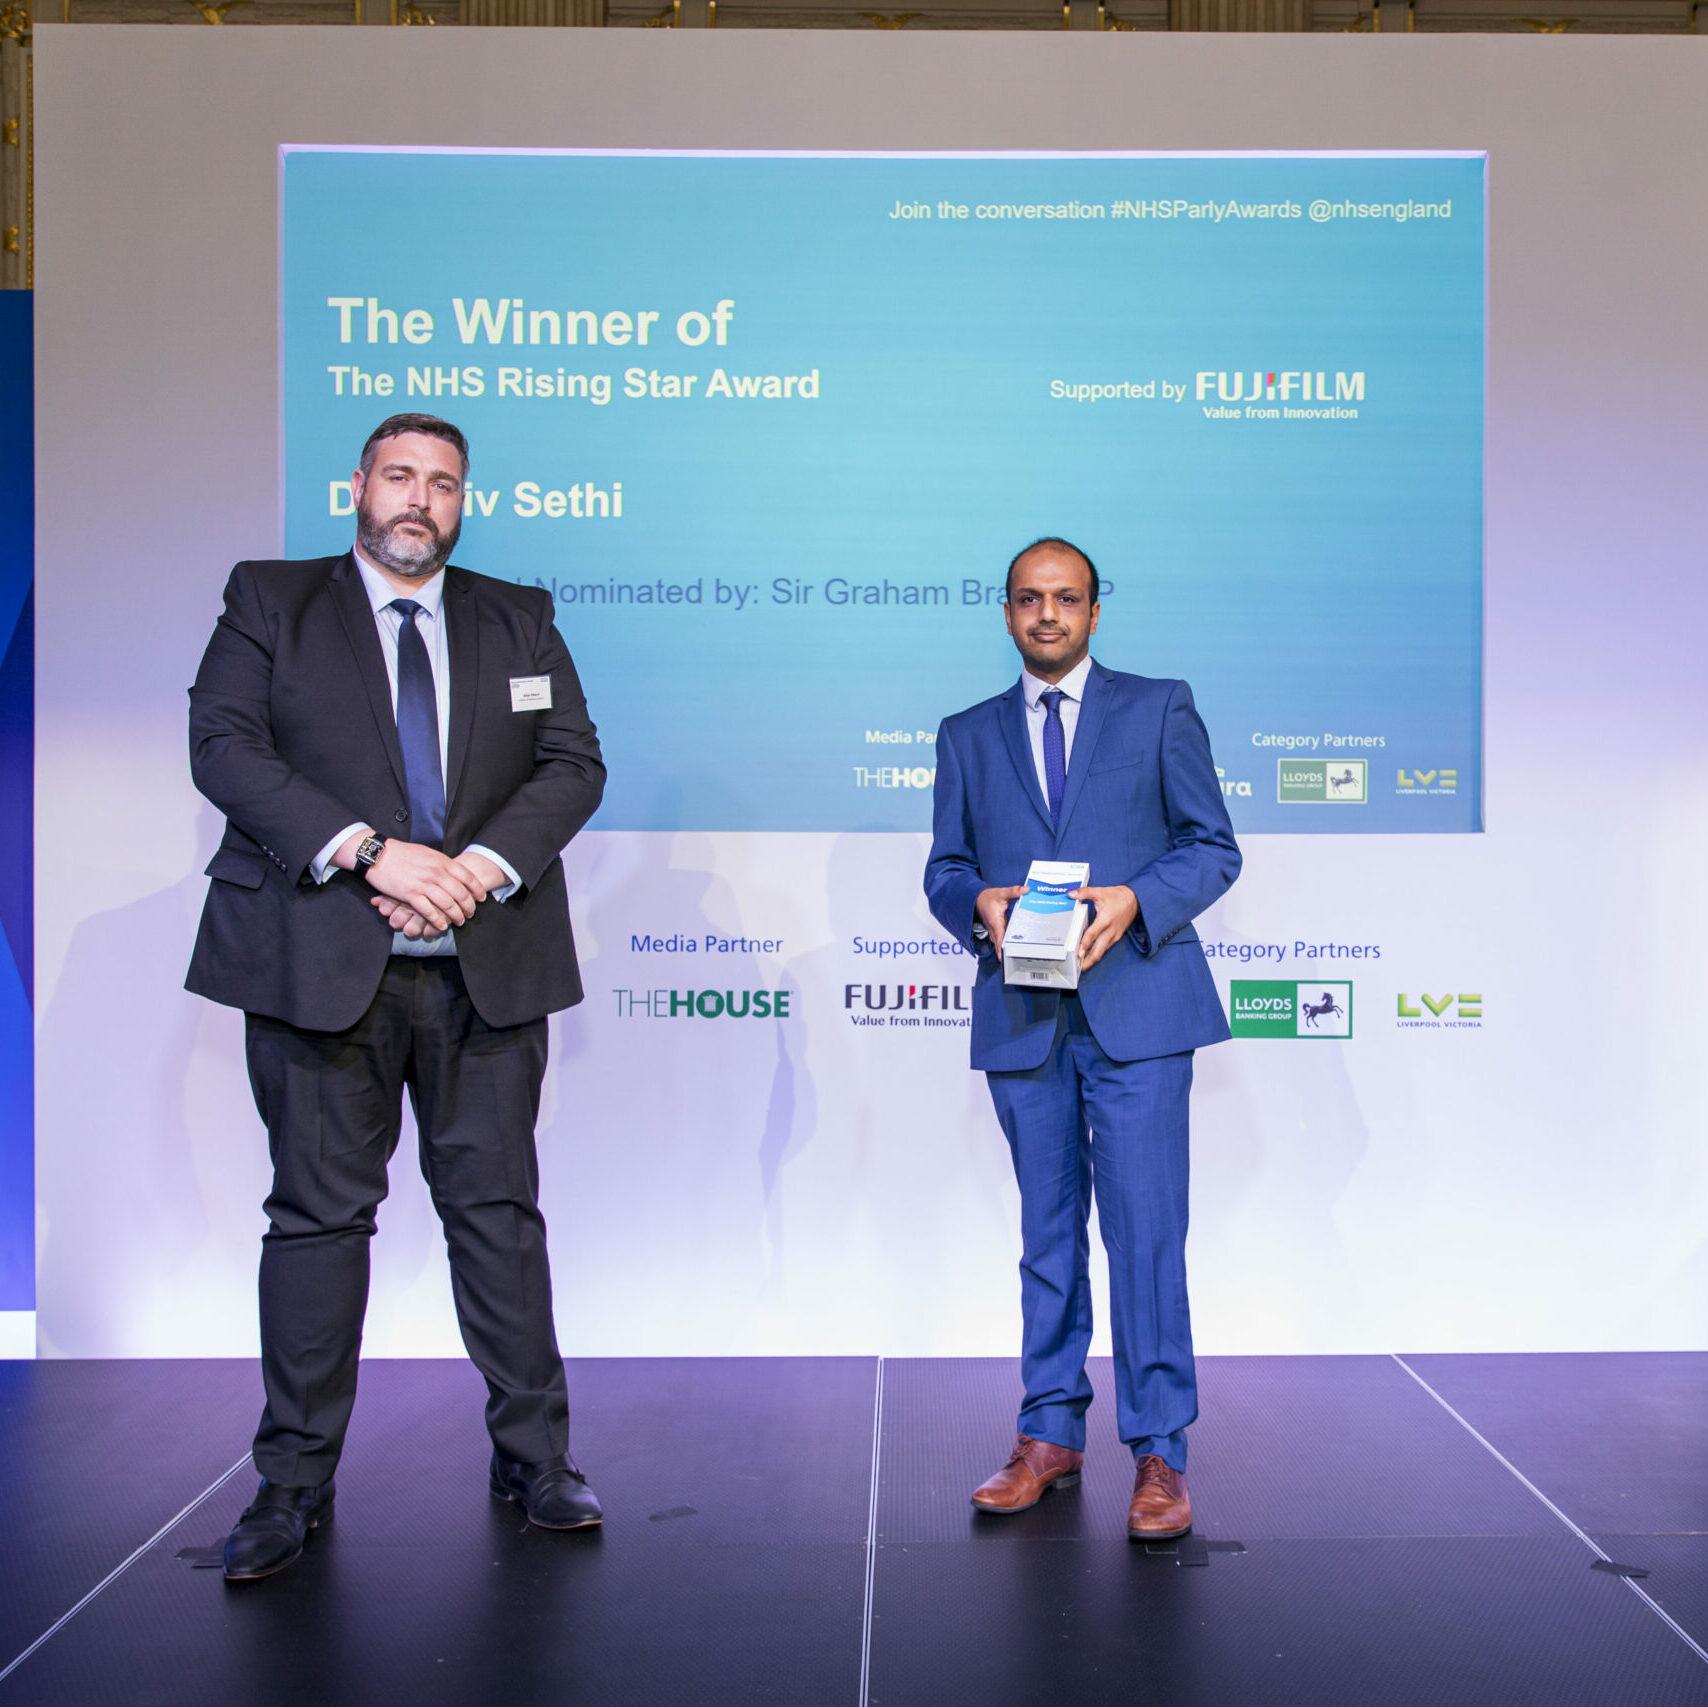 Rajiv Sethi is stood on stage receiving The NHS Rising Star award